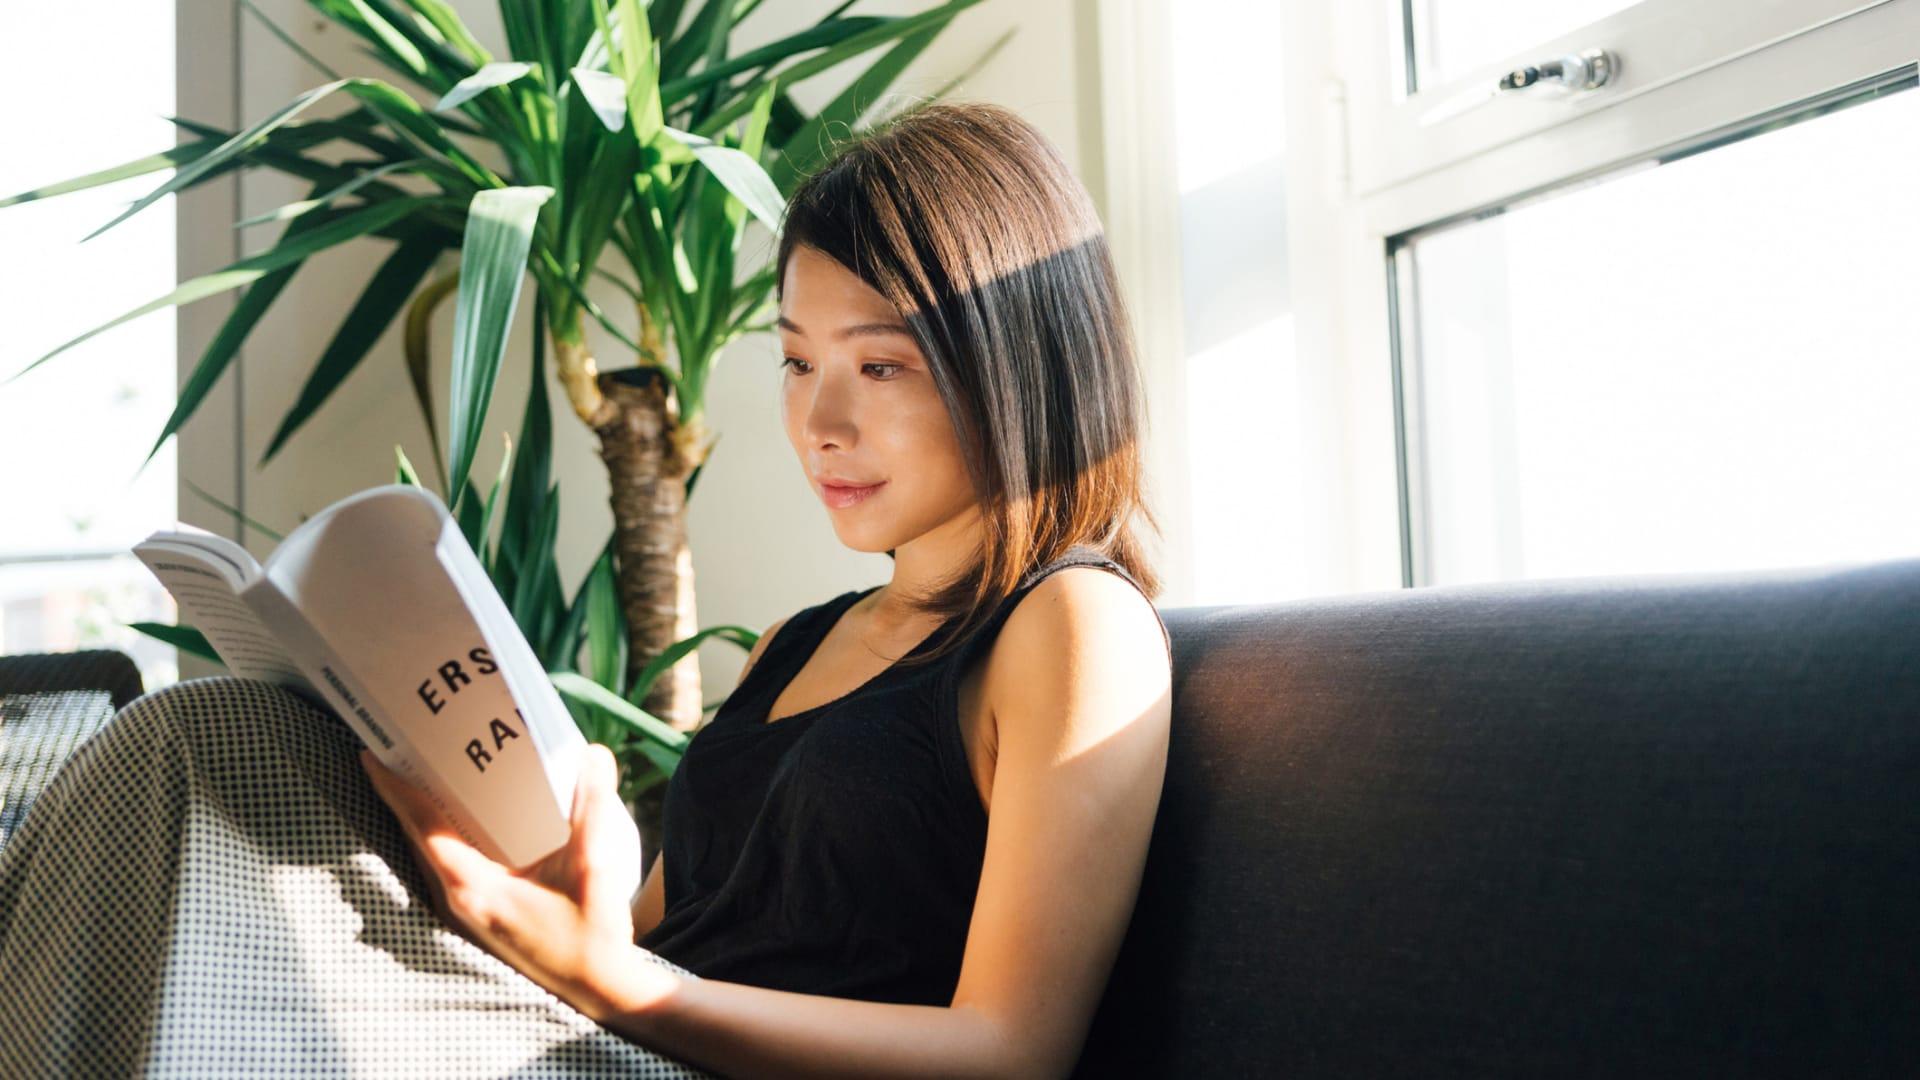 10 Books Jeff Bezos Thinks You Should Read